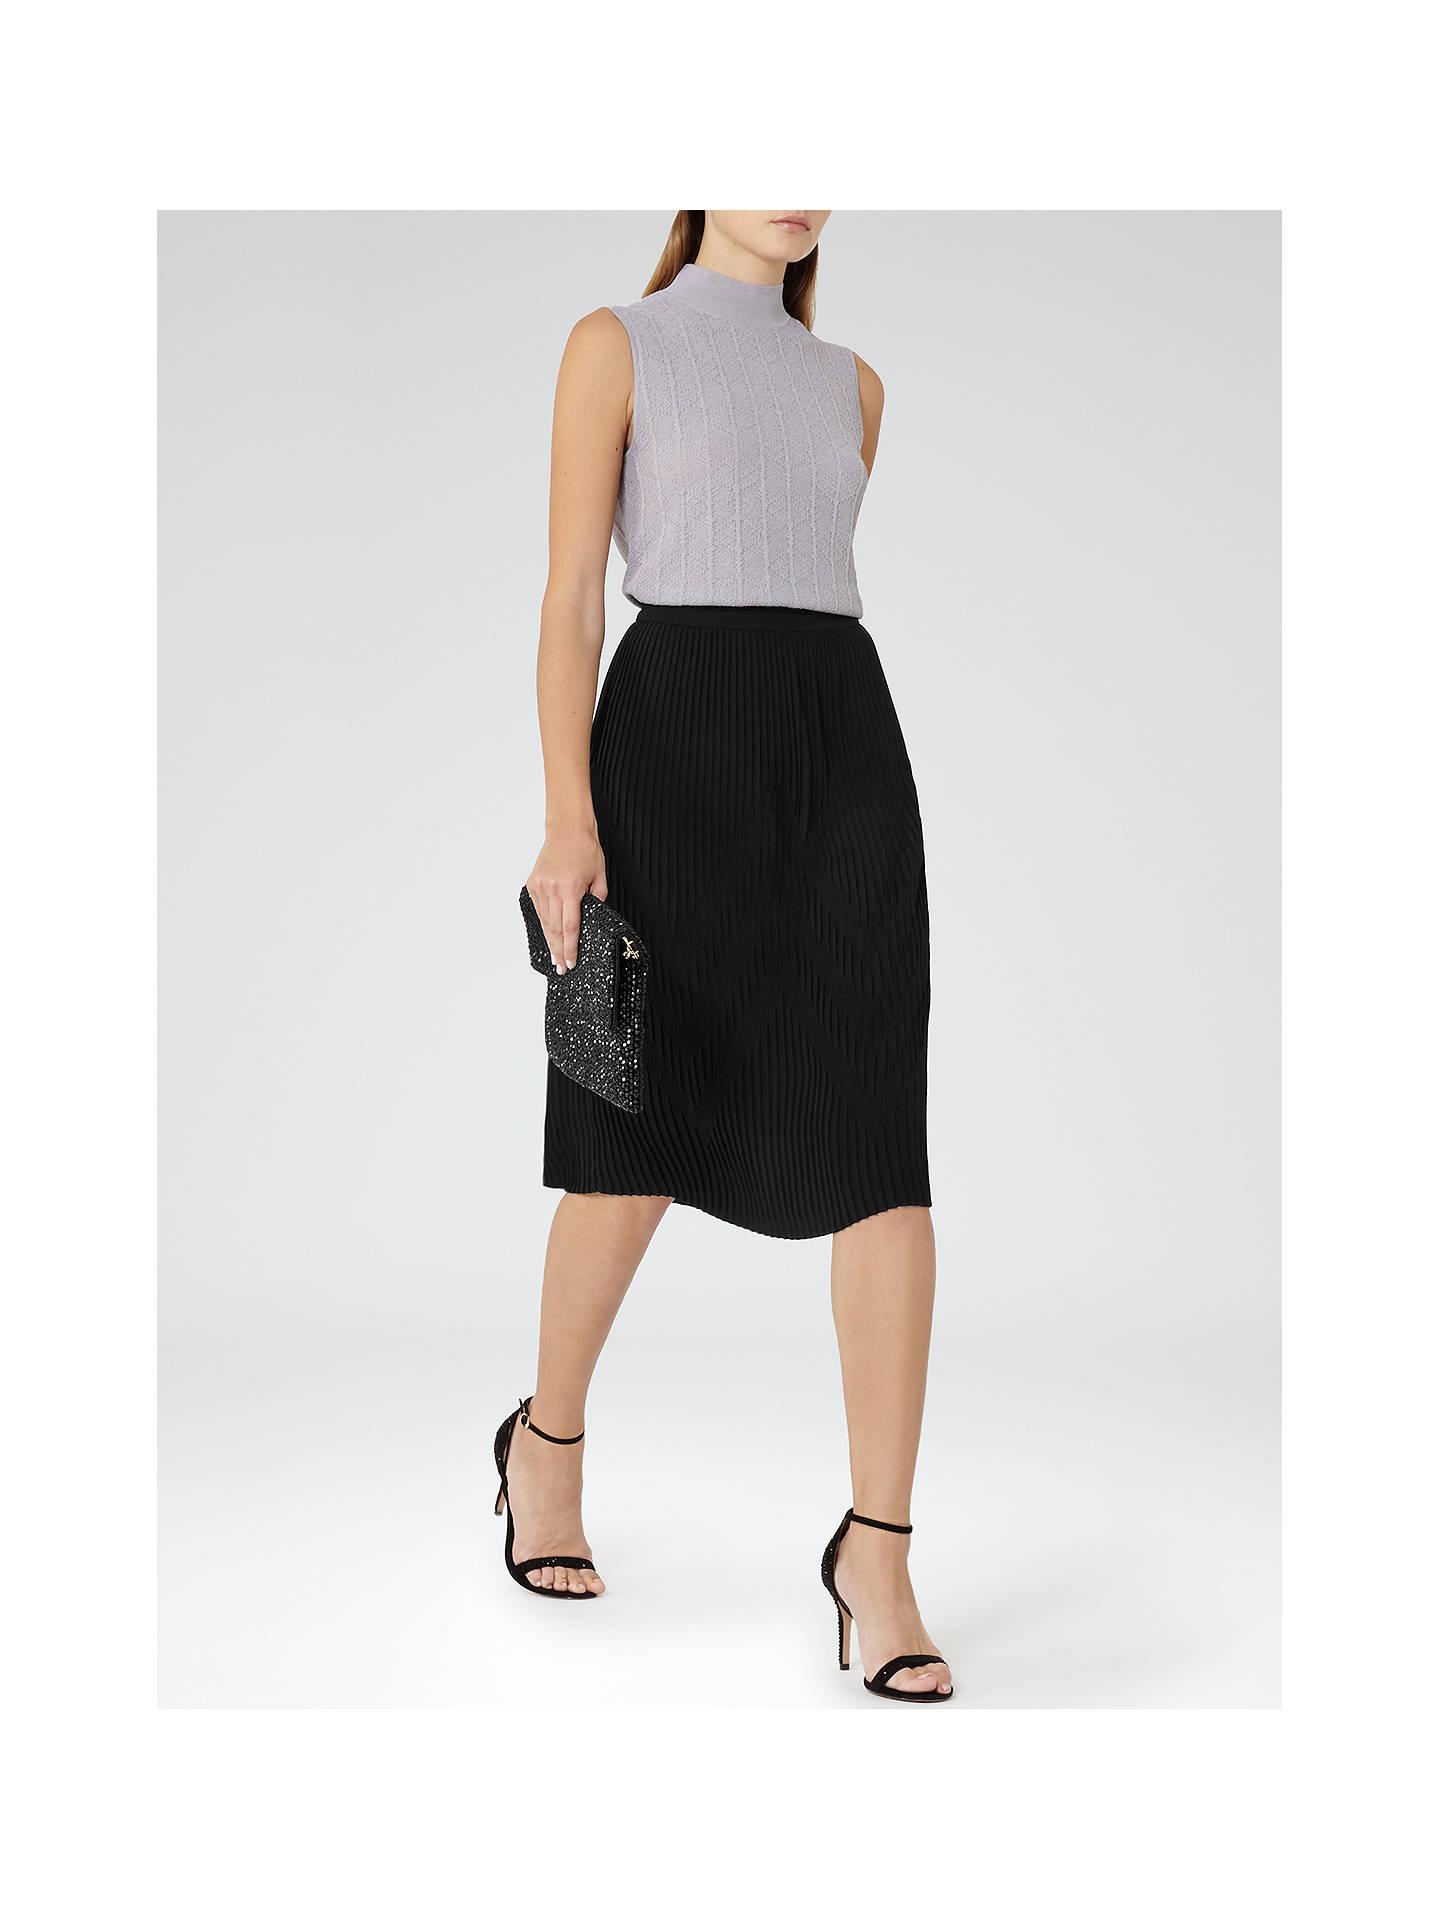 6b1253475 ... Buy Reiss Trudy Plisse Midi Skirt, Black, 6 Online at johnlewis.com